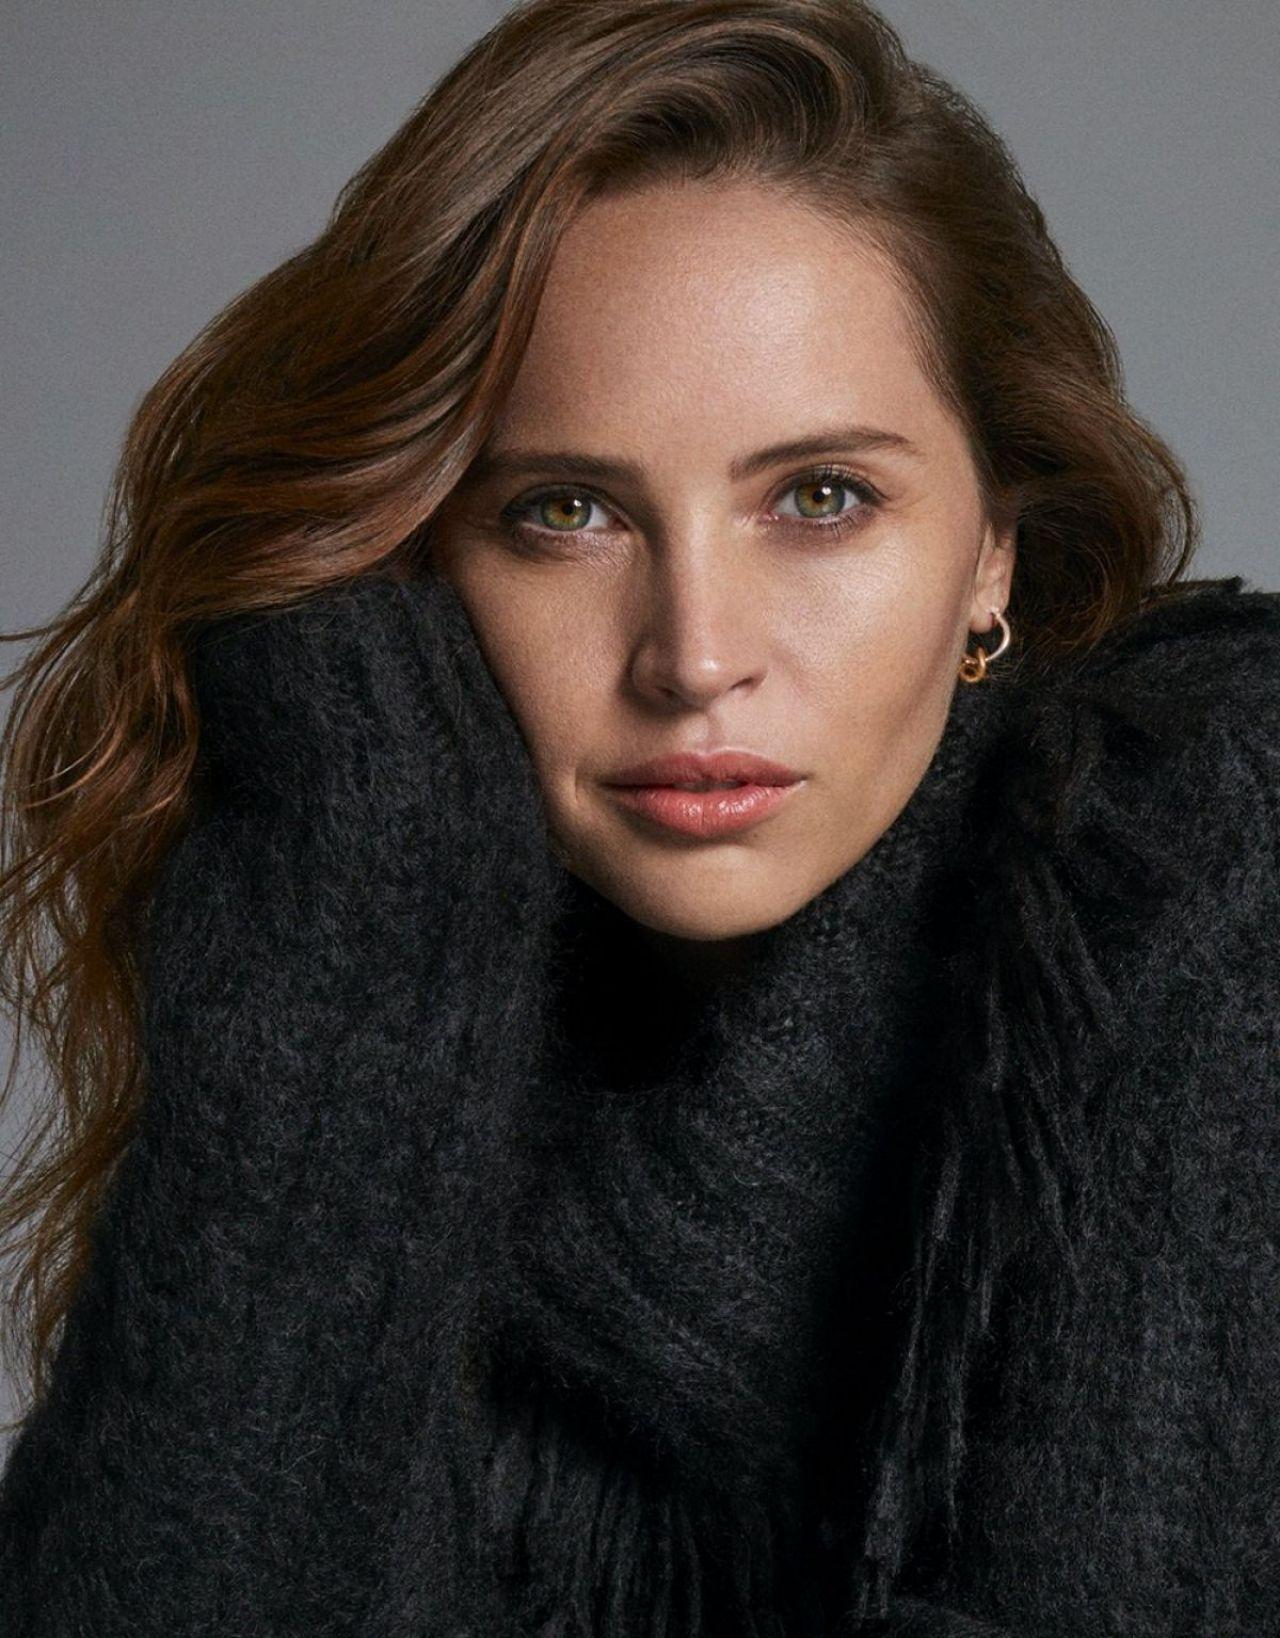 https://celebmafia.com/wp-content/uploads/2018/11/felicity-jones-s-magazine-winter-2019-5.jpg